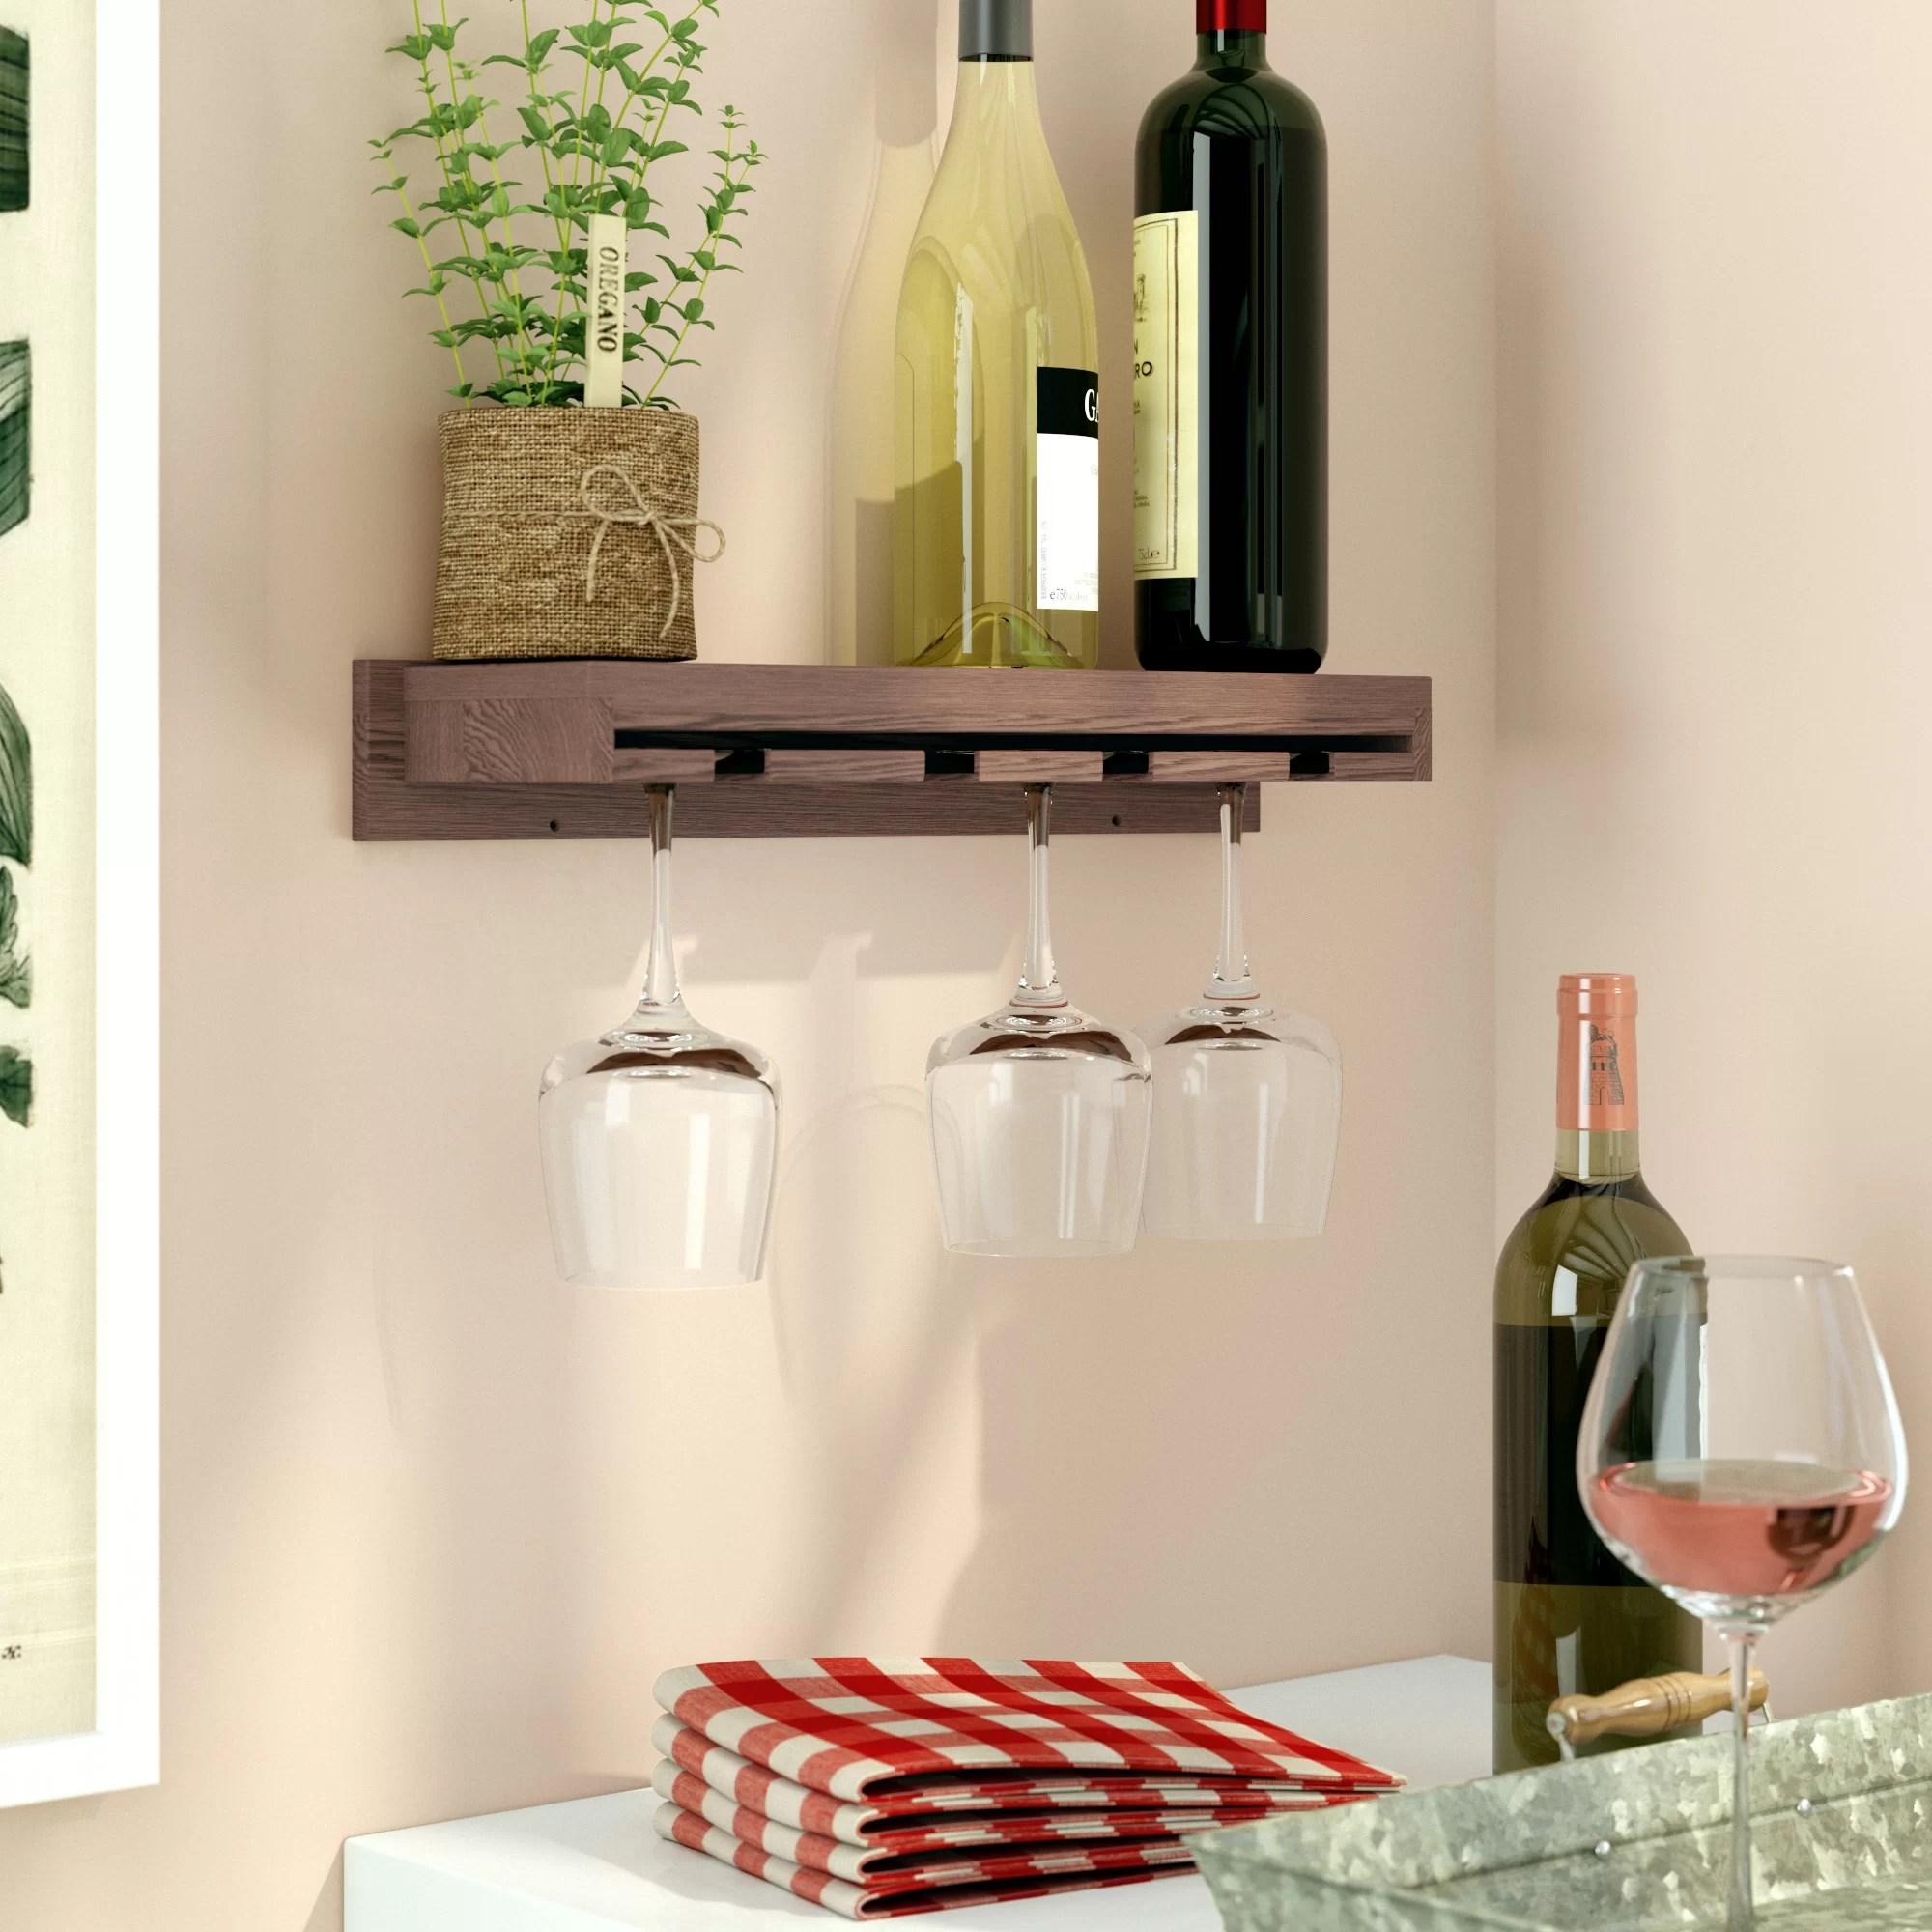 erithon wall mounted wine glass rack